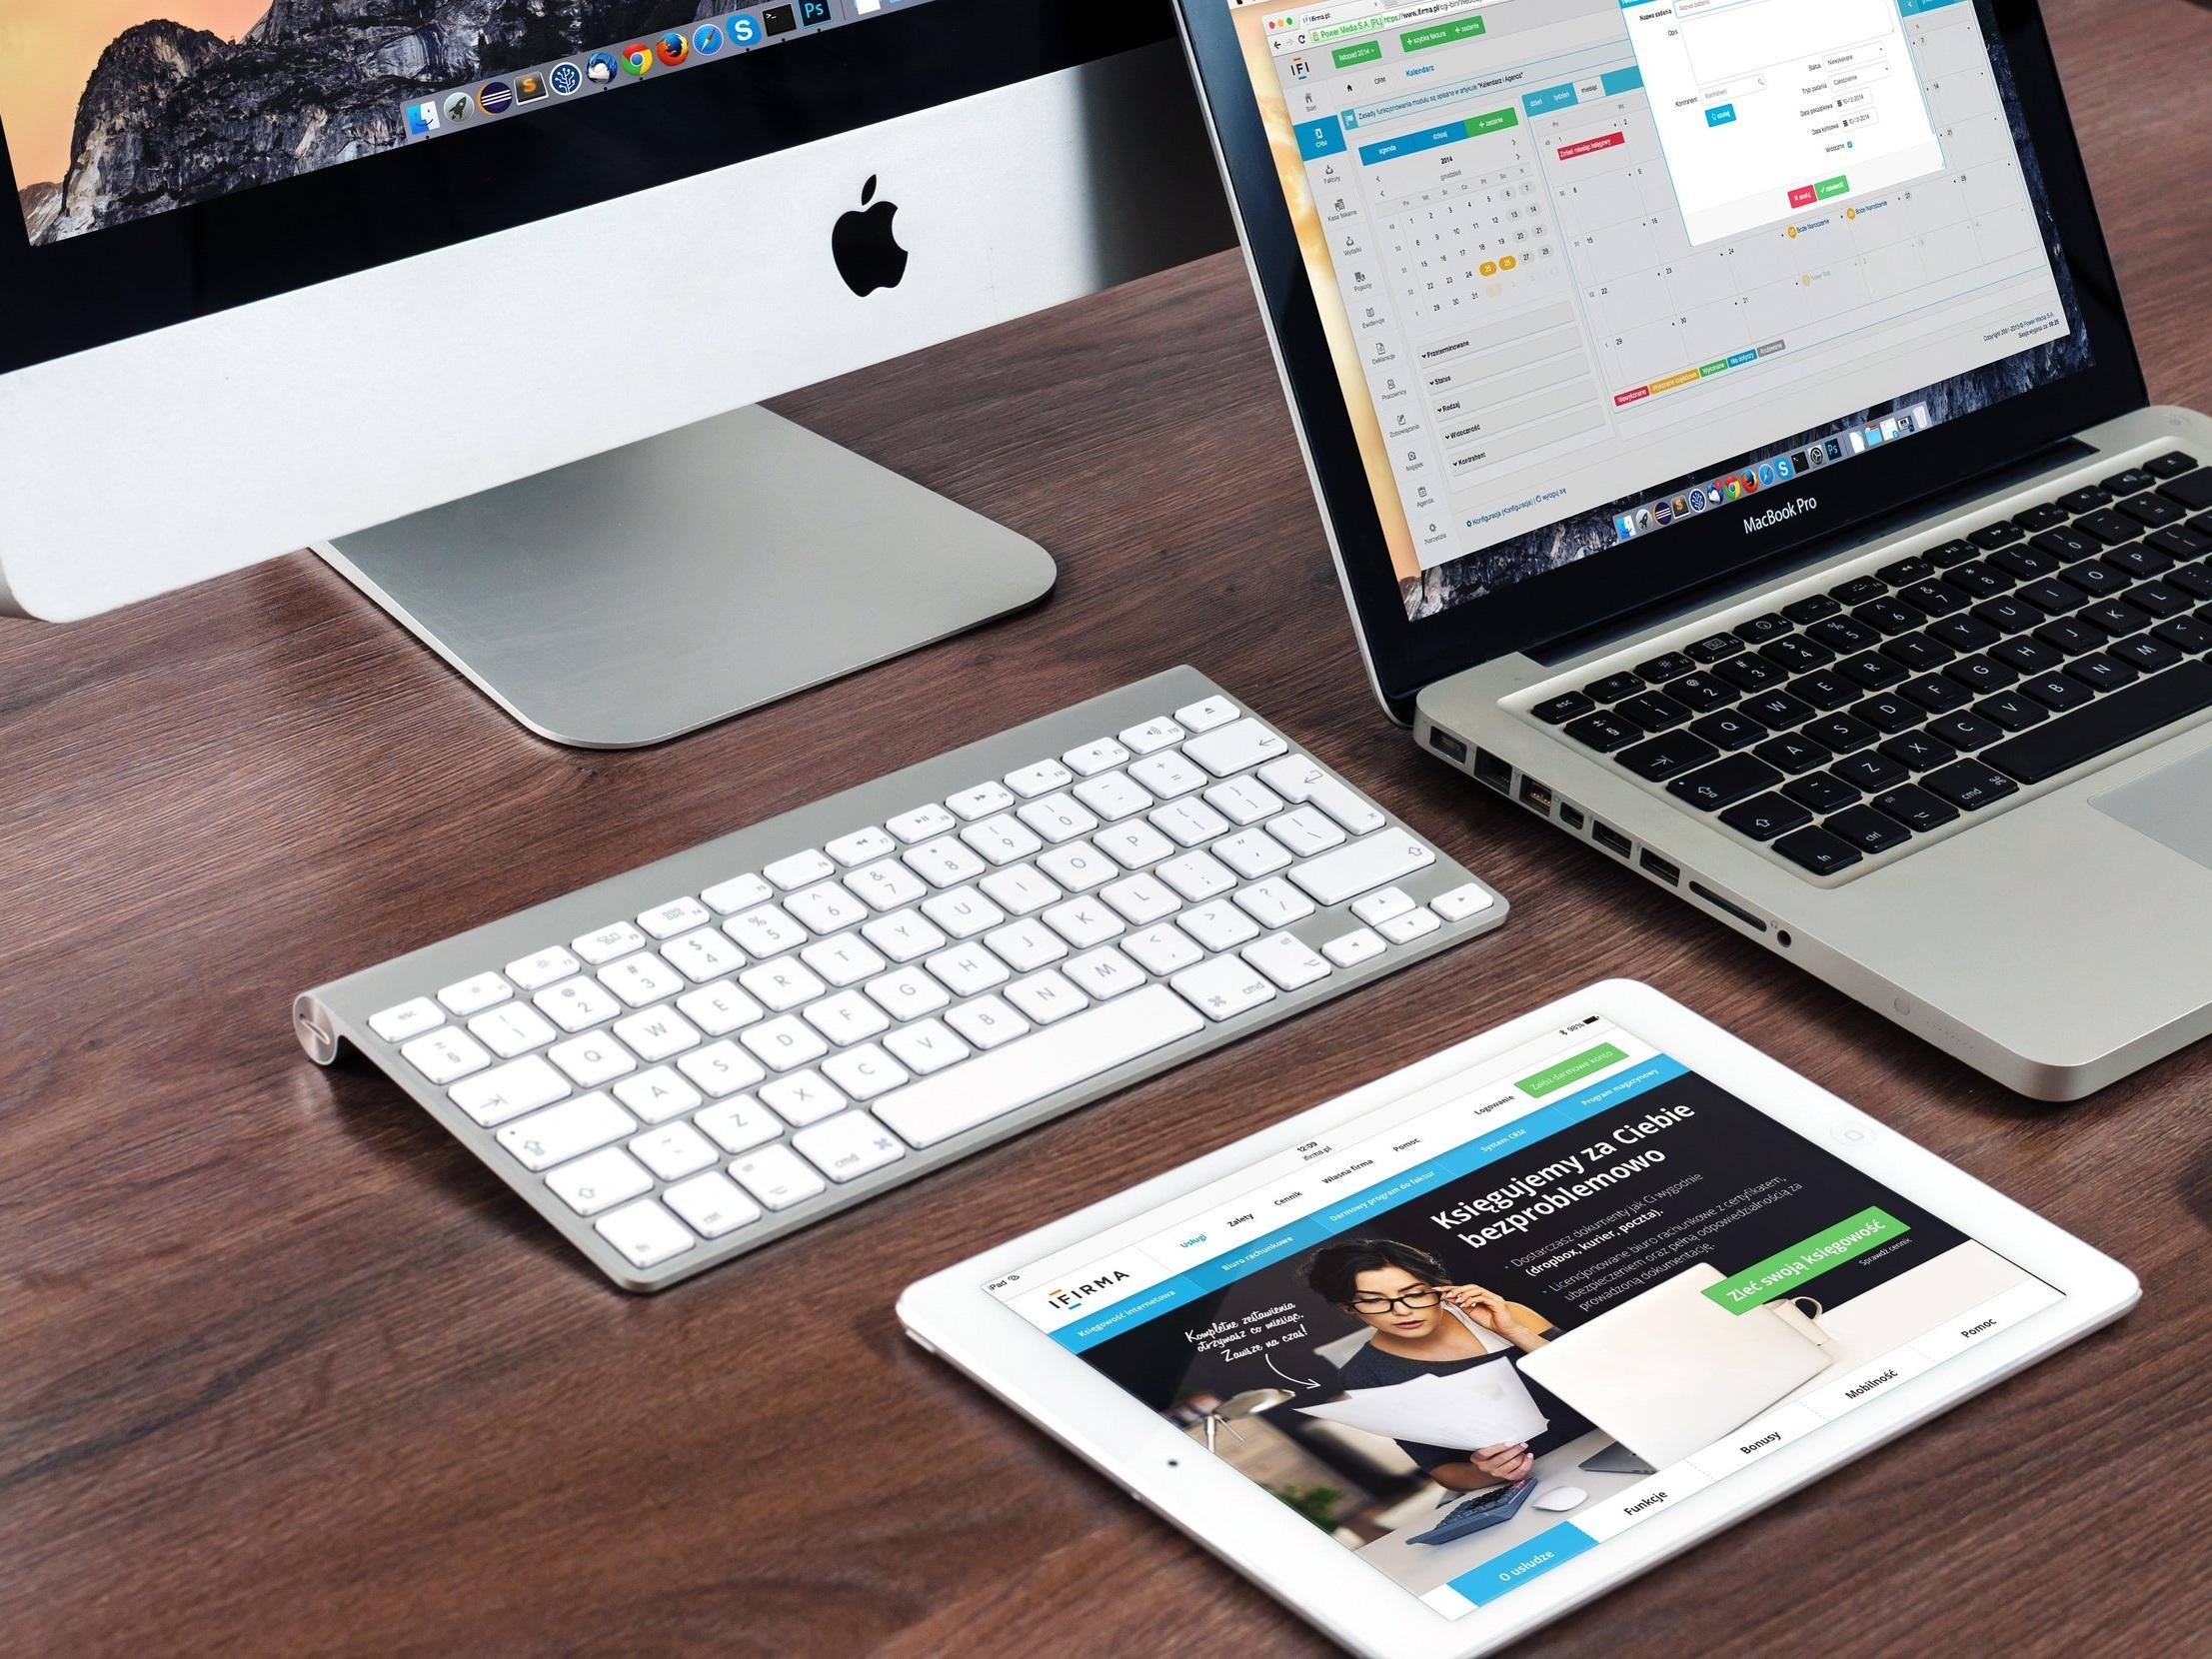 apple-business-computer-39284.jpg